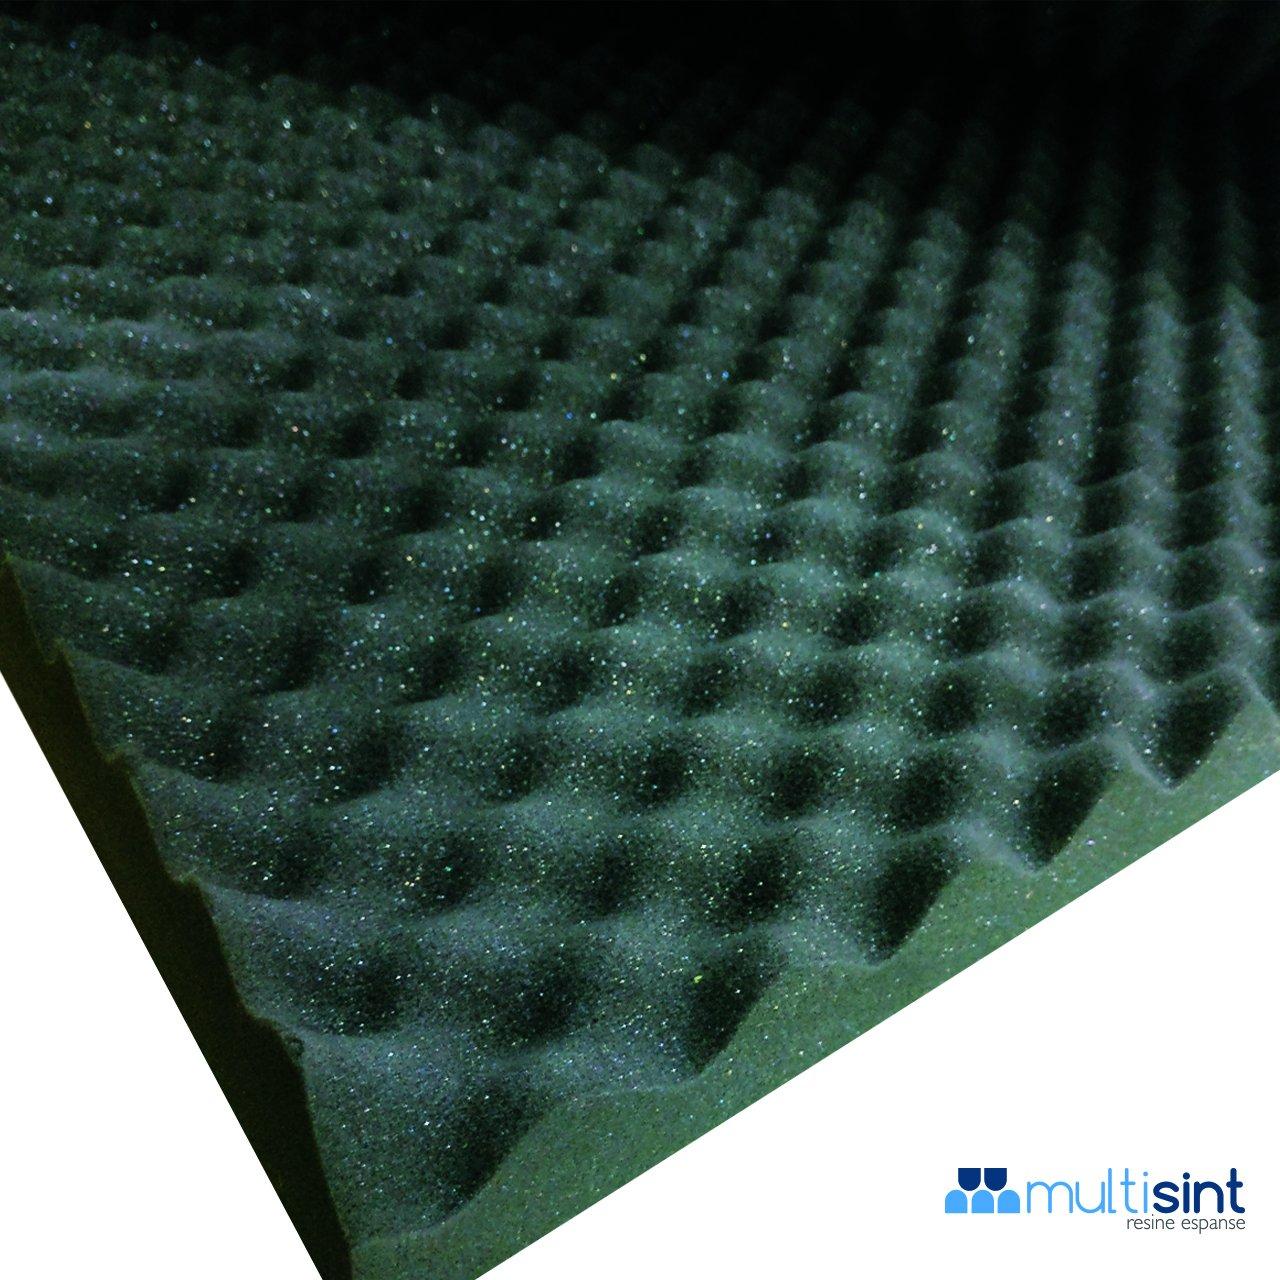 Paneles aislamiento acústico bugnati - Espuma de poliuretano 50 x 50 x 4,8 cm densidad 18 - Color Negro + pegamento MULTISPRAY (unidades 8 paneles + 1 ...